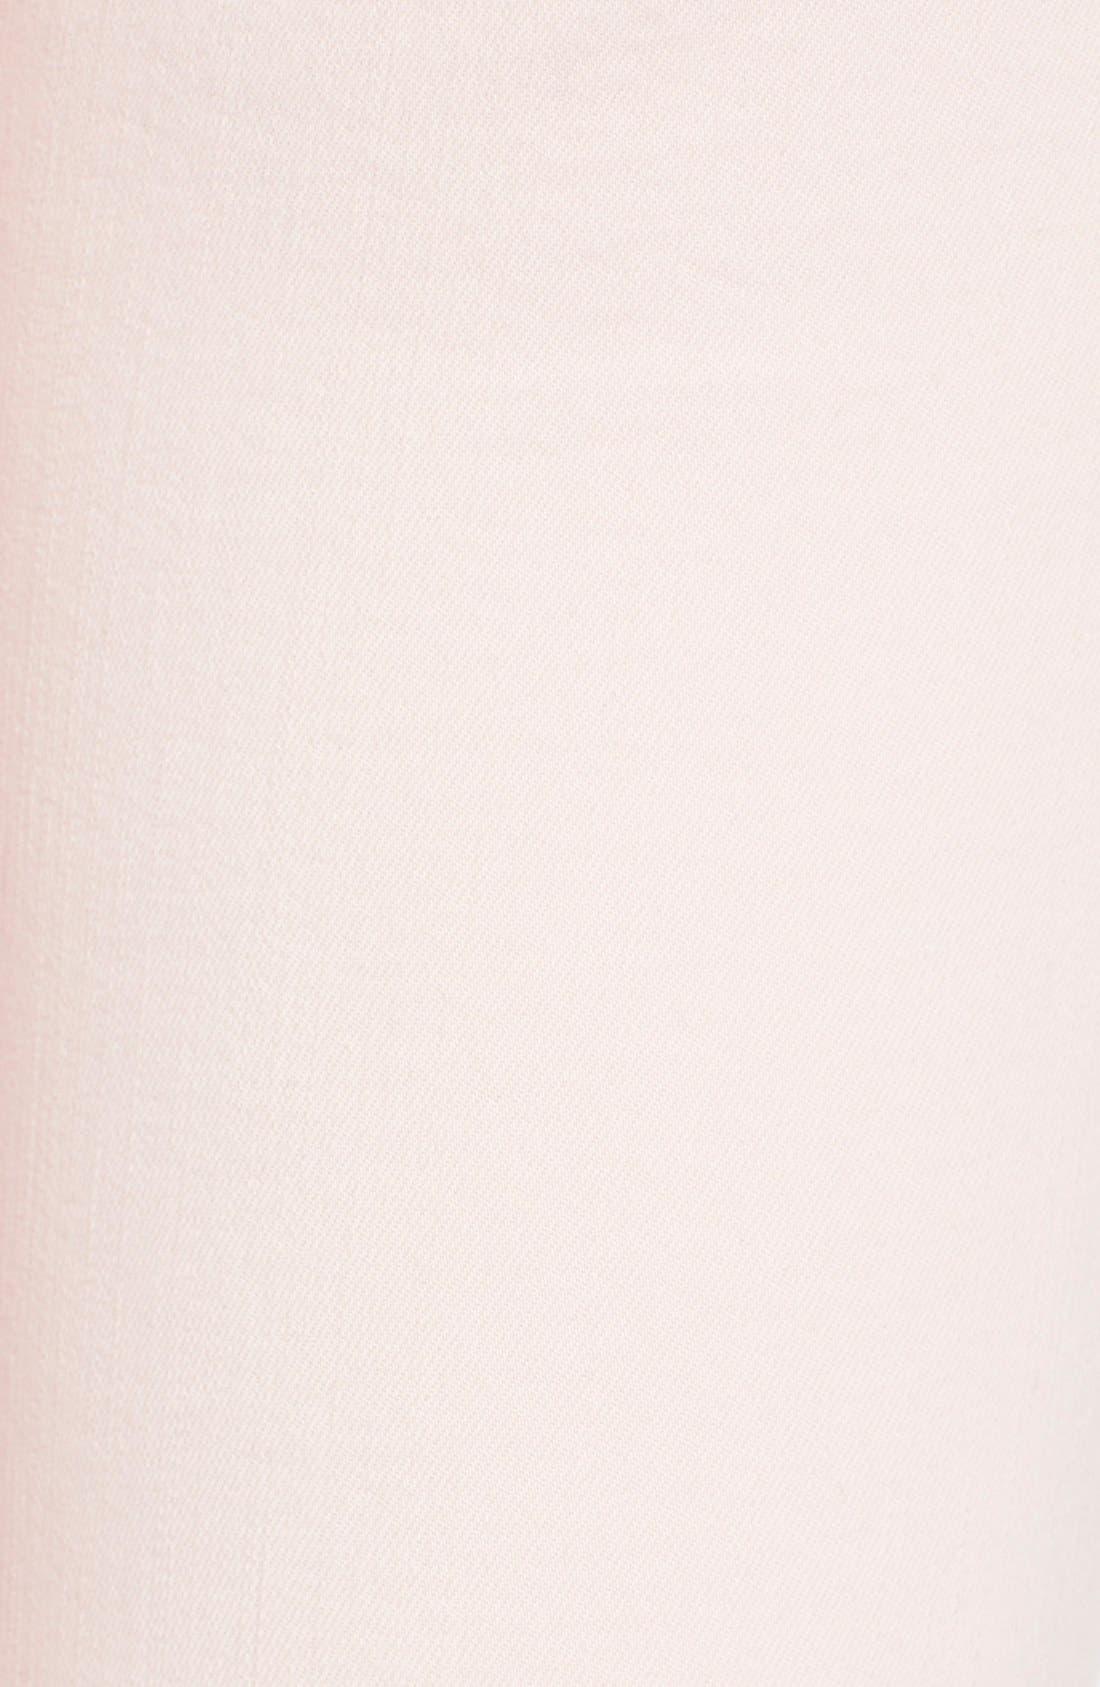 J BRAND,                             'Little Pink Jean' Low RiseCropSkinny Jeans,                             Alternate thumbnail 4, color,                             650